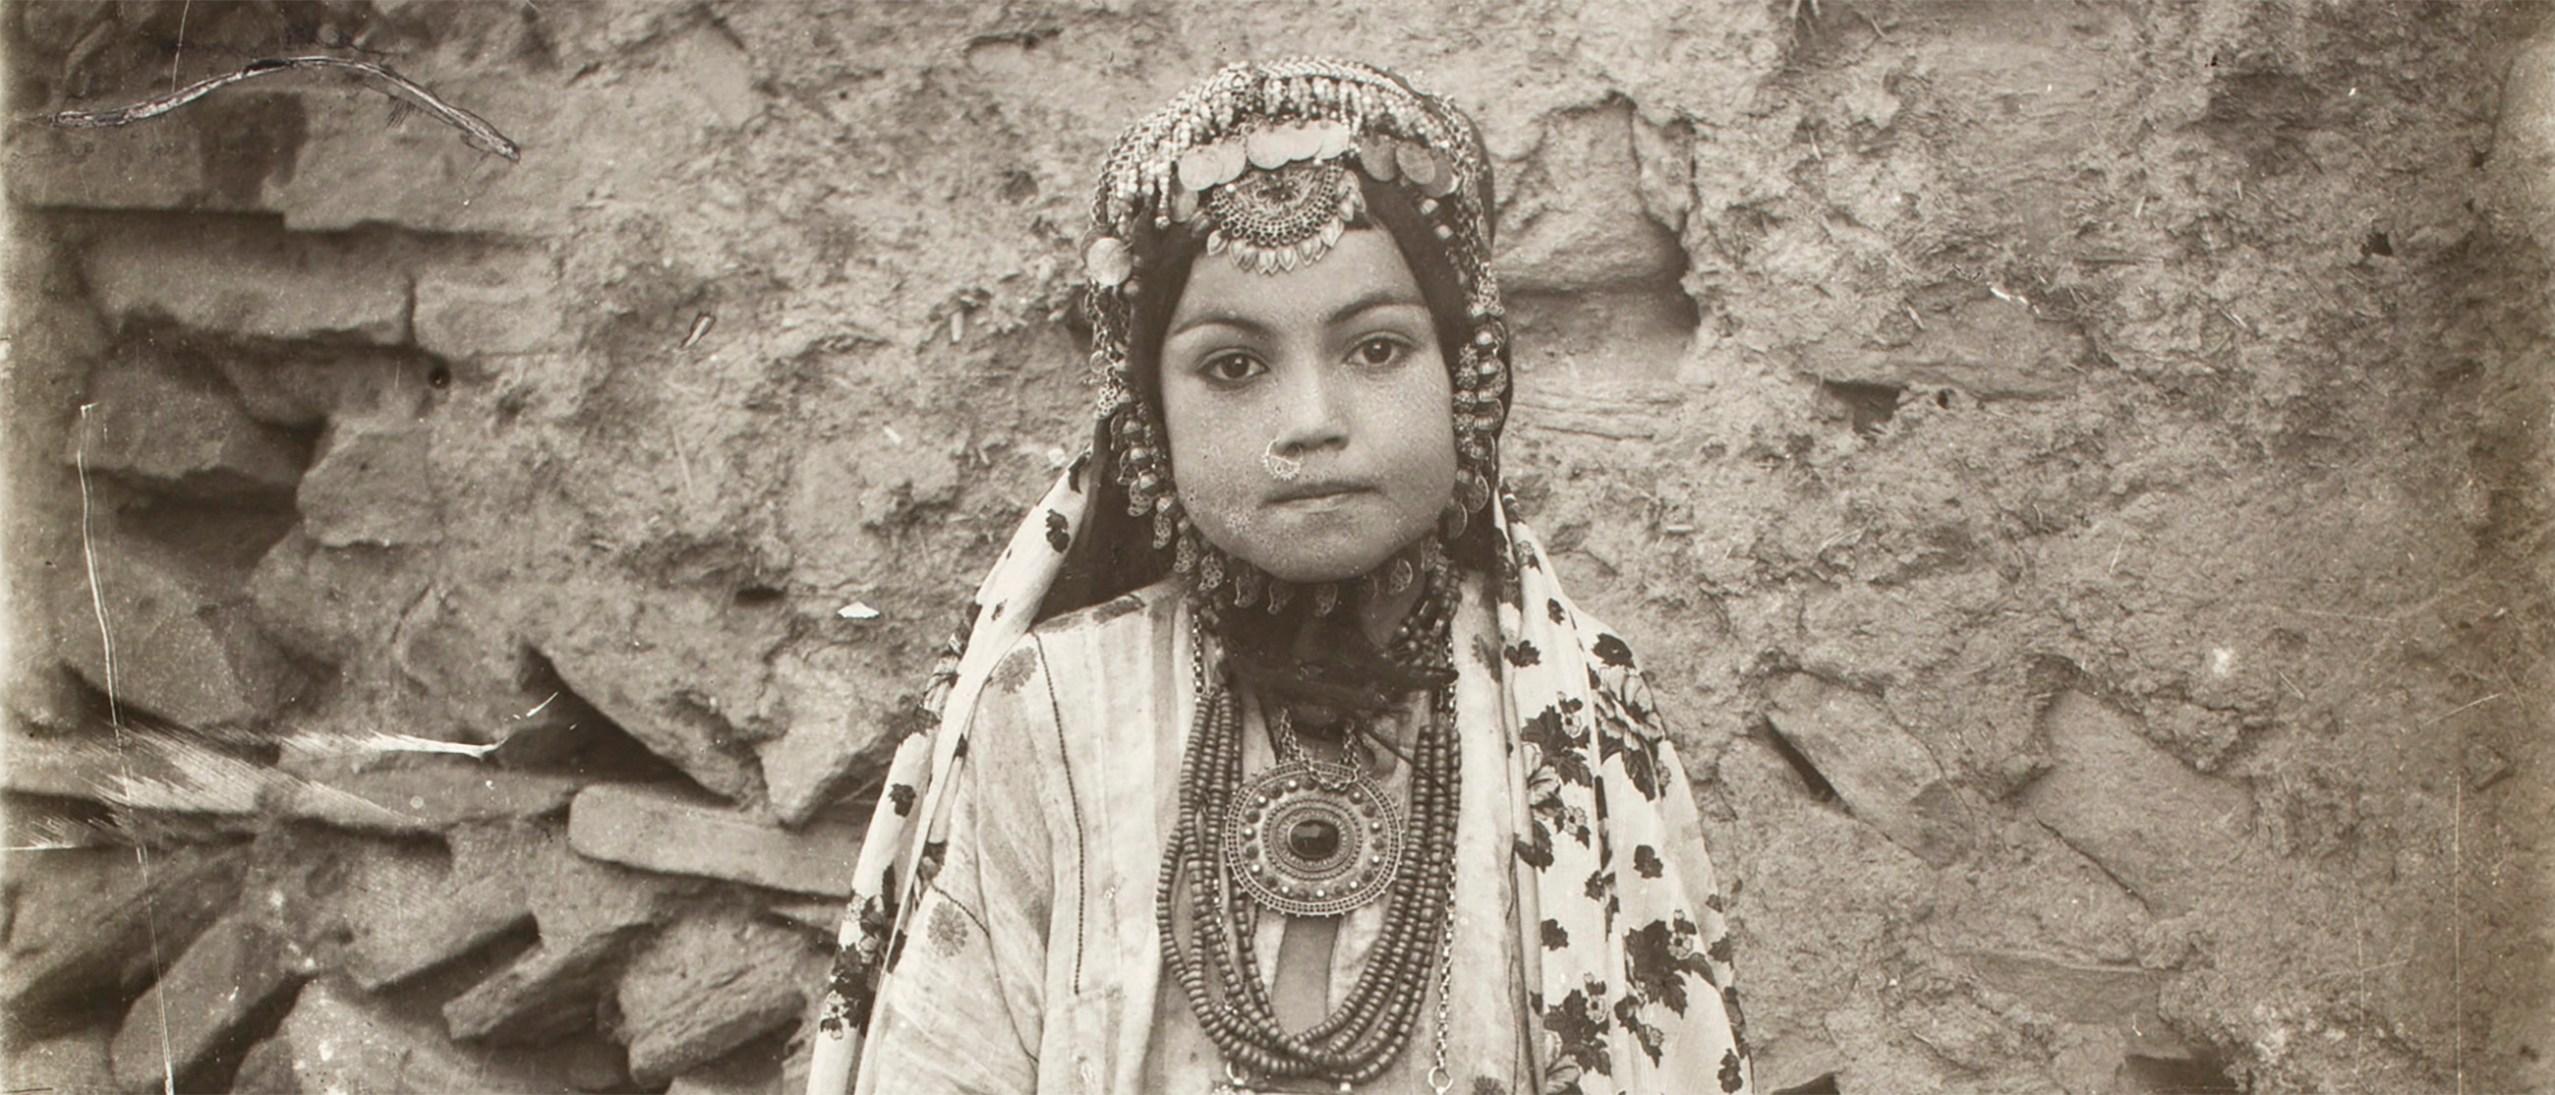 Photo, Portrait of Jewish Girl in Elaborate Costume; Sevruguin, Antoin, 1870s-1928, b&w ; 17.5 cm. x 23.3 cm.; FSA_A.4_2.12.Up.55